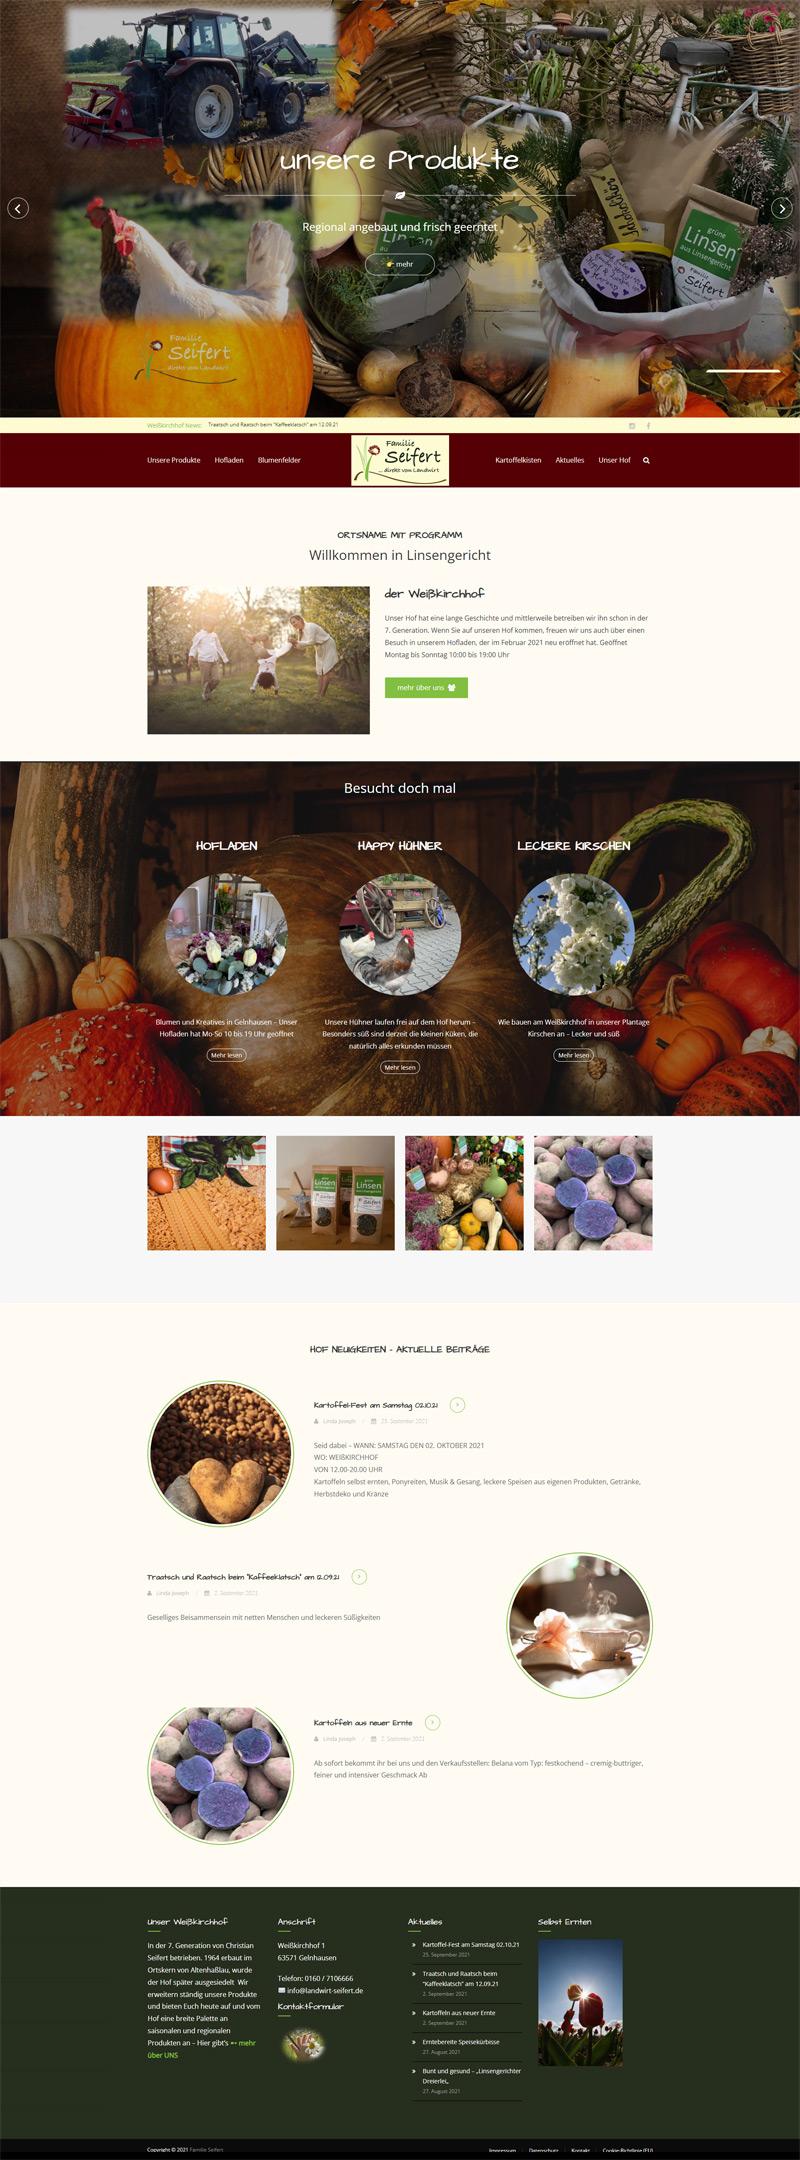 Homepage Landwirt Seifert